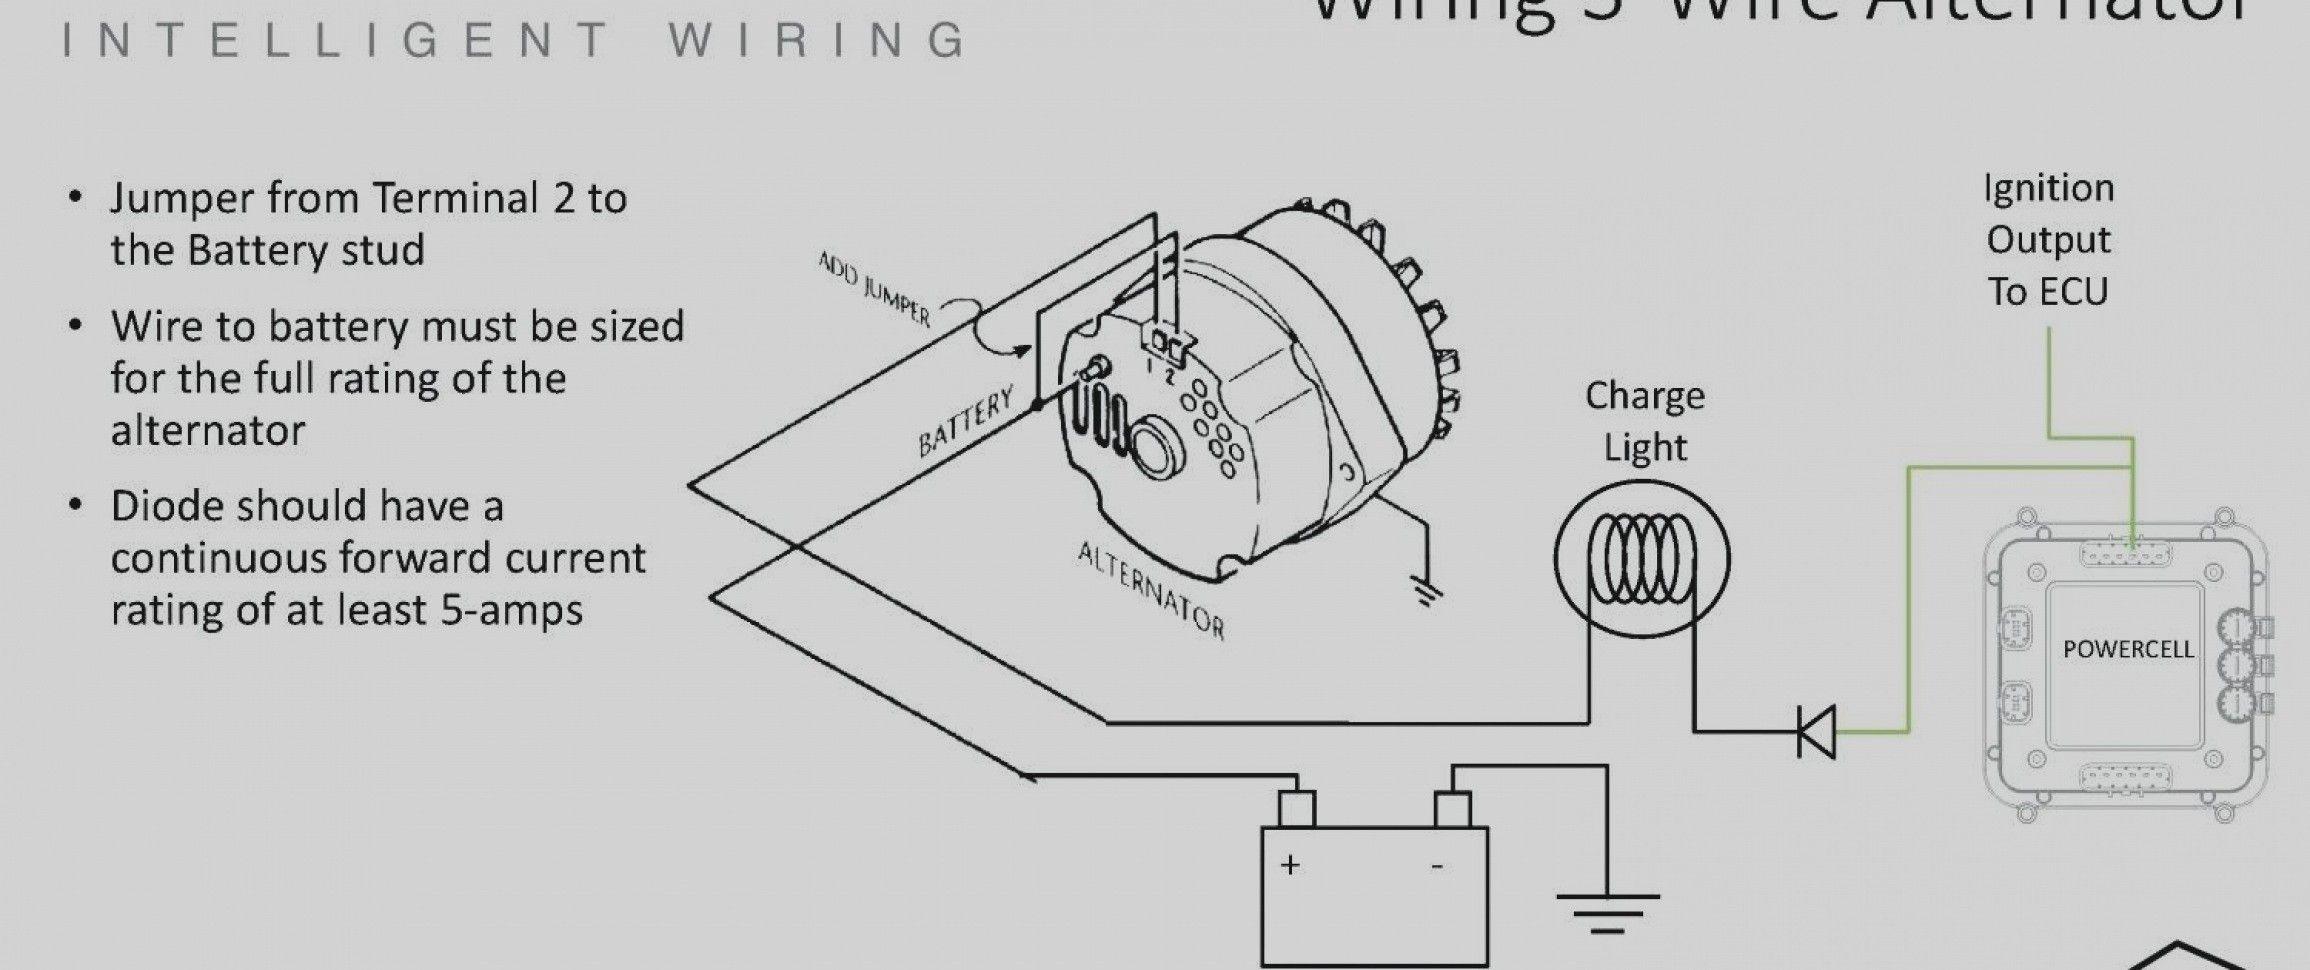 Luxury Wiring Diagram Of An Alternator #diagrams #